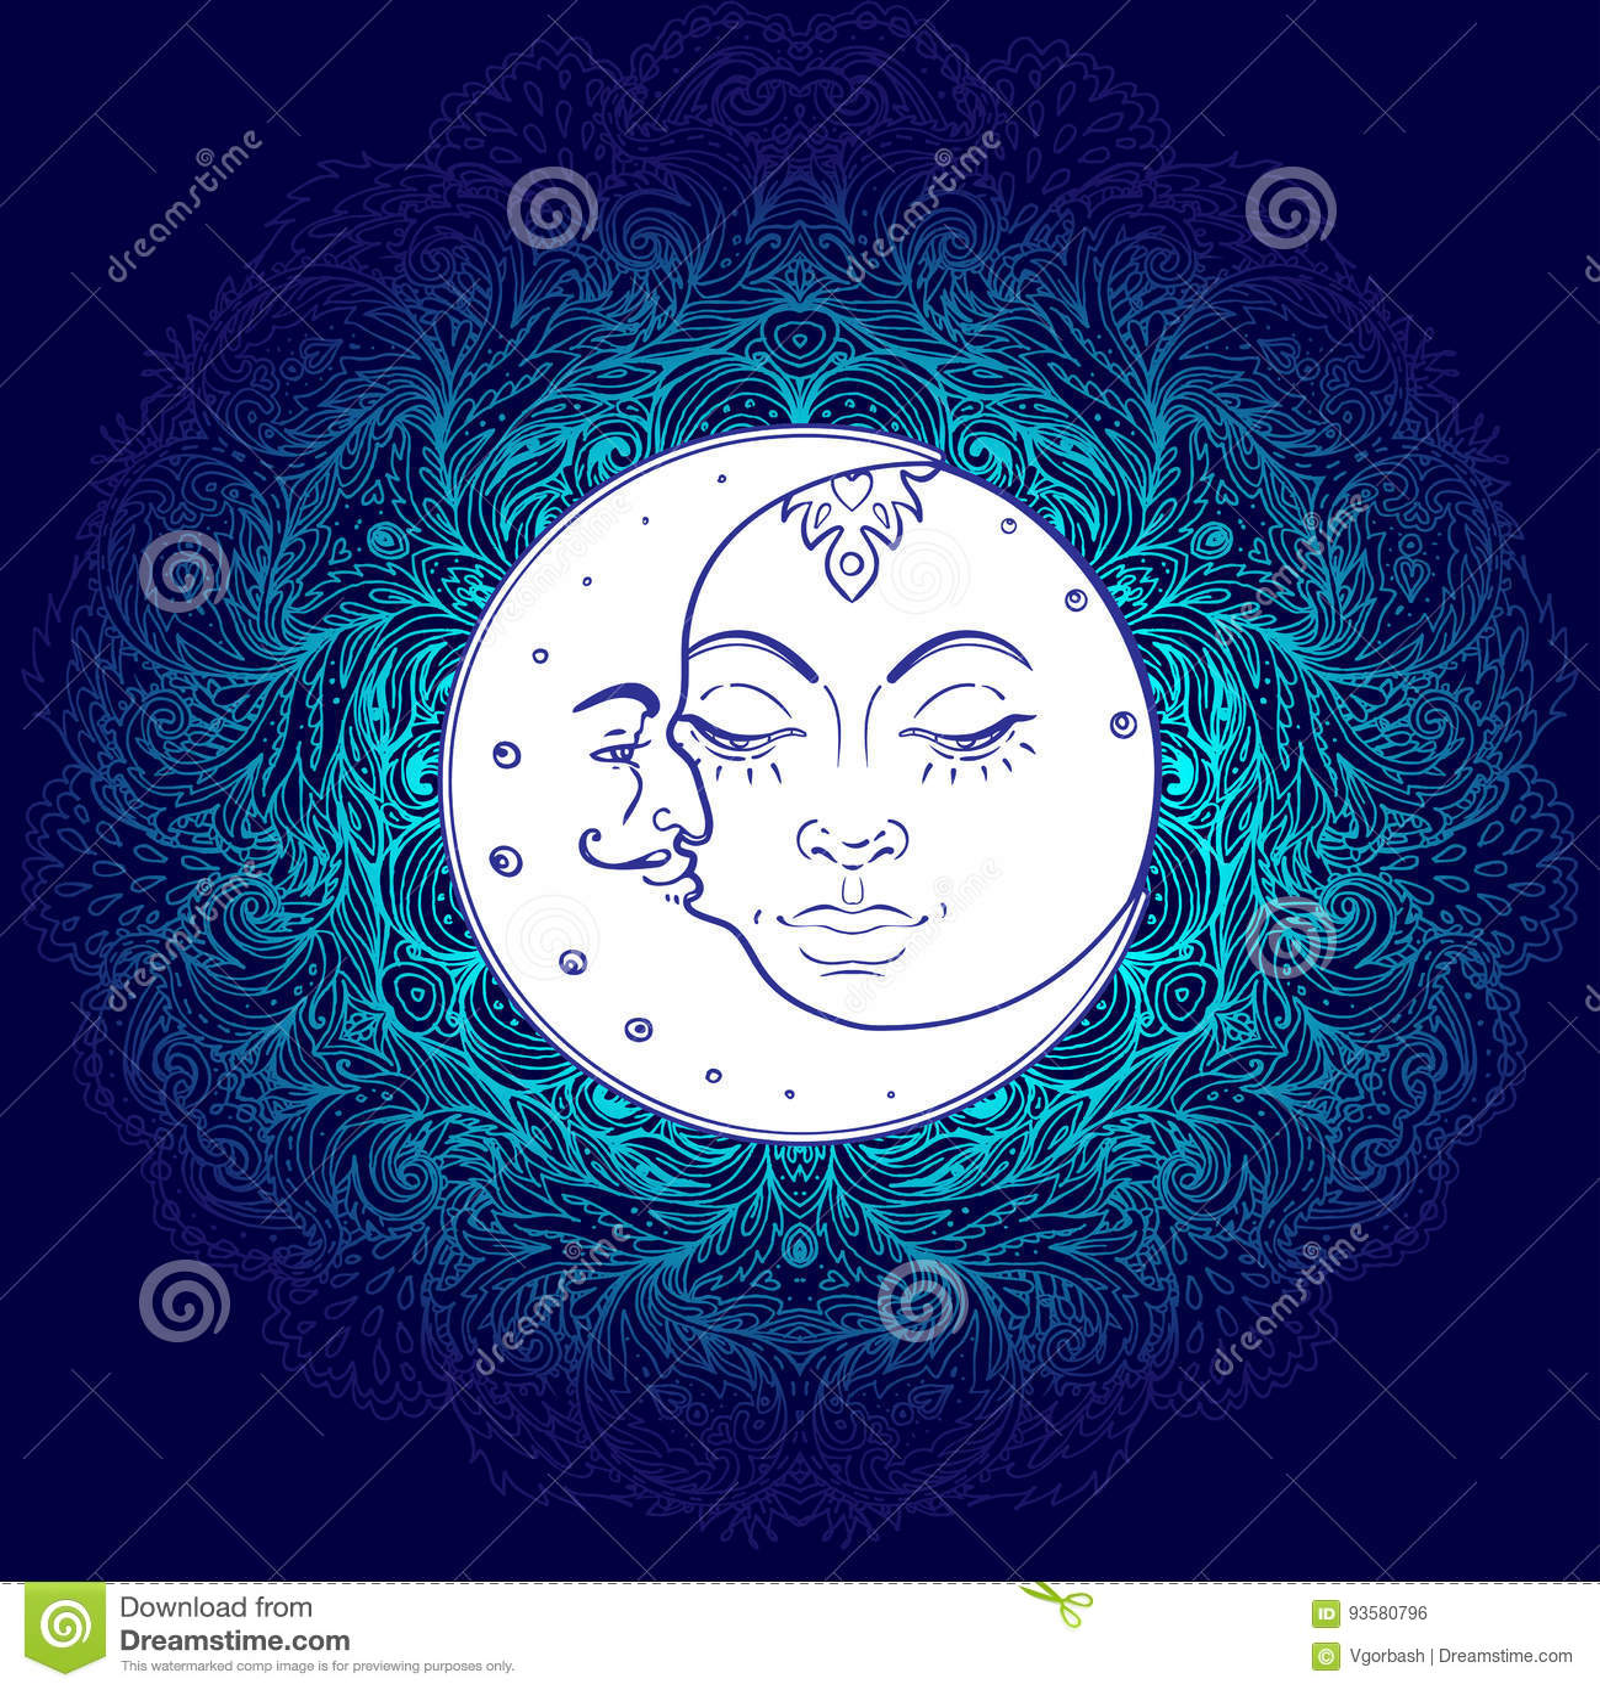 Sun Moon Symbols As A Face Inside Ornate Colorful Mandala